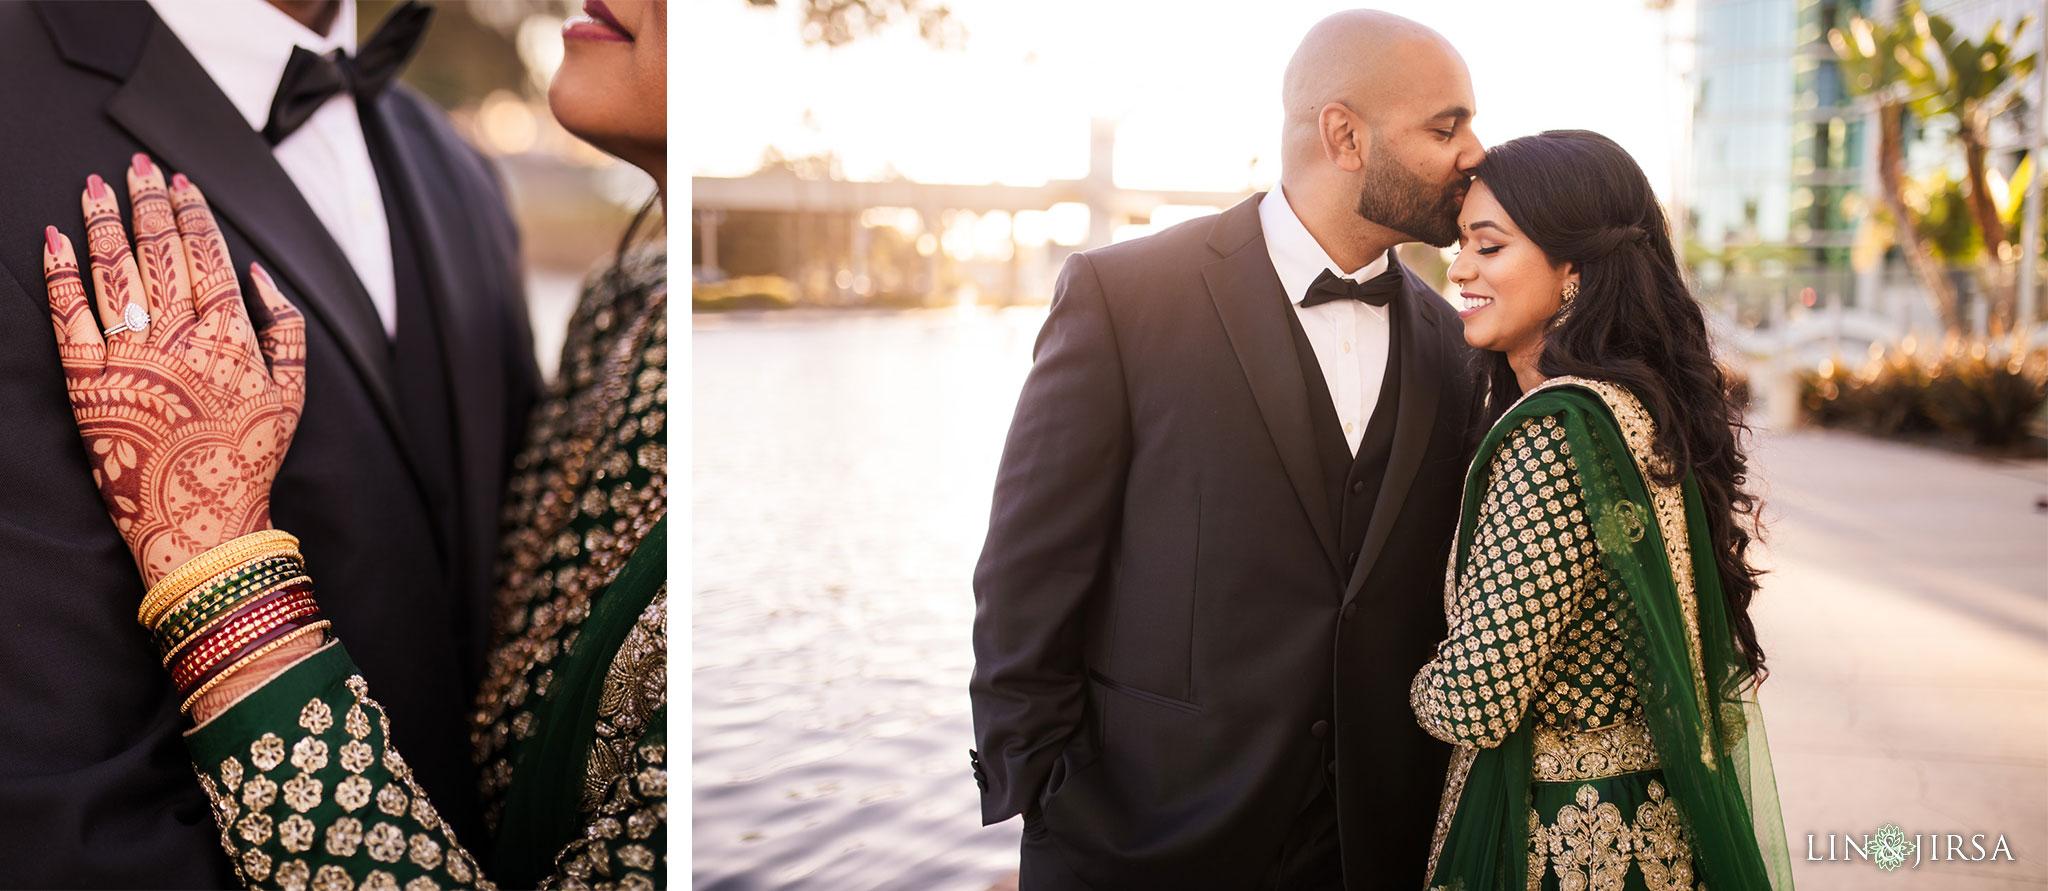 30 long beach hyatt south indian wedding photography